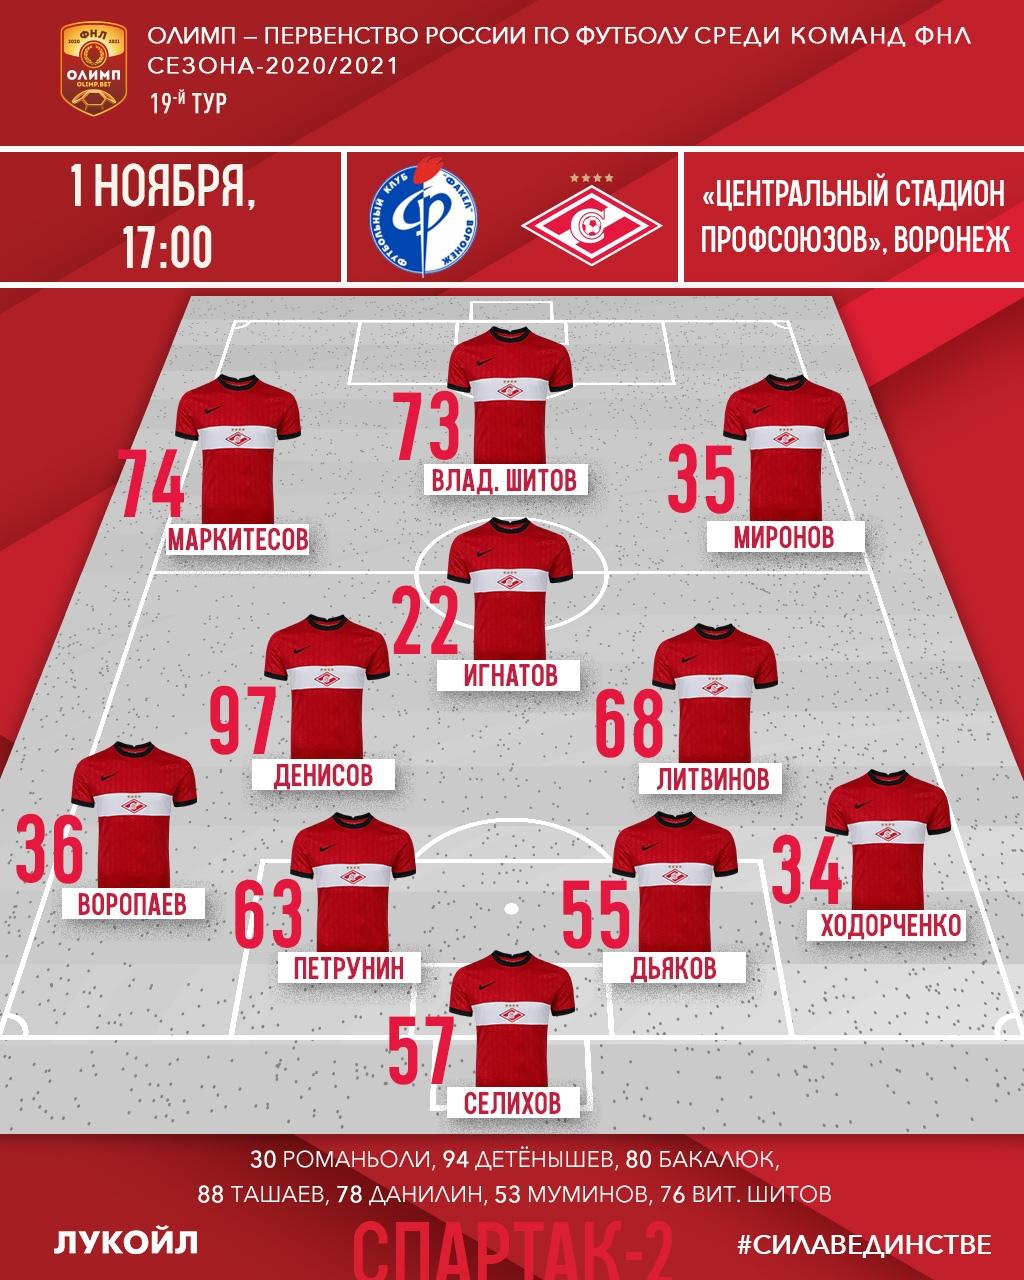 Состав «Спартака-2» на матч 19-го тура ФНЛ с «Факелом»